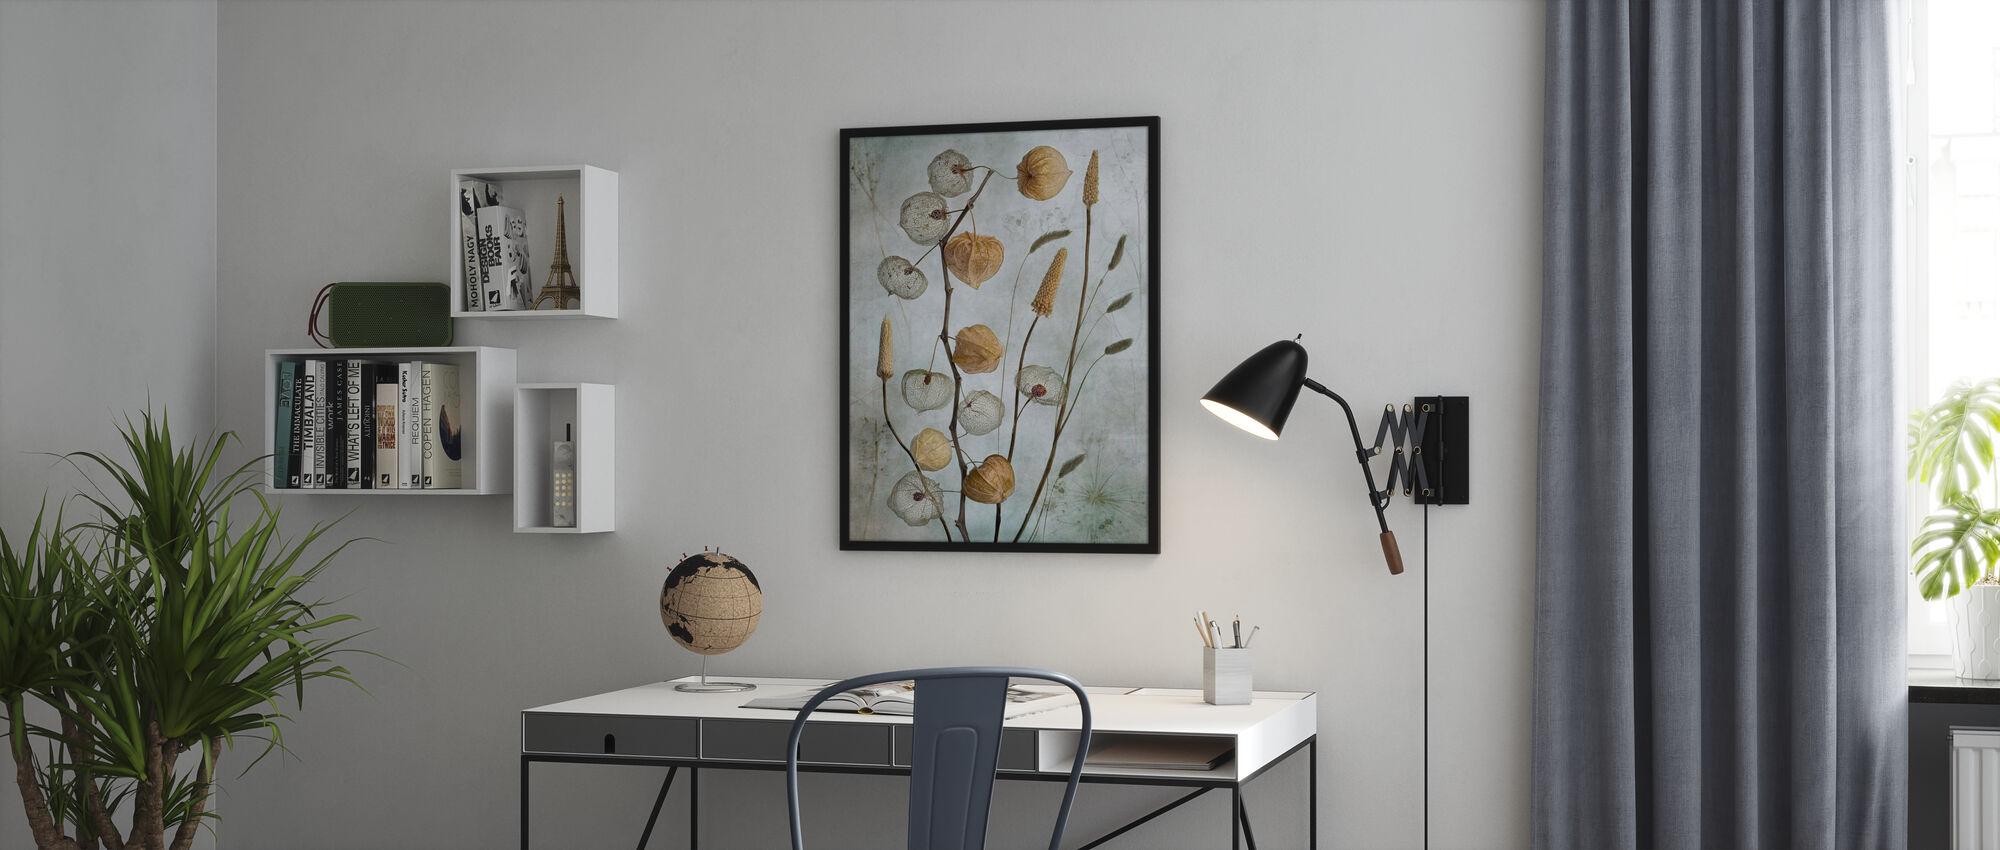 Lanterns - Poster - Office